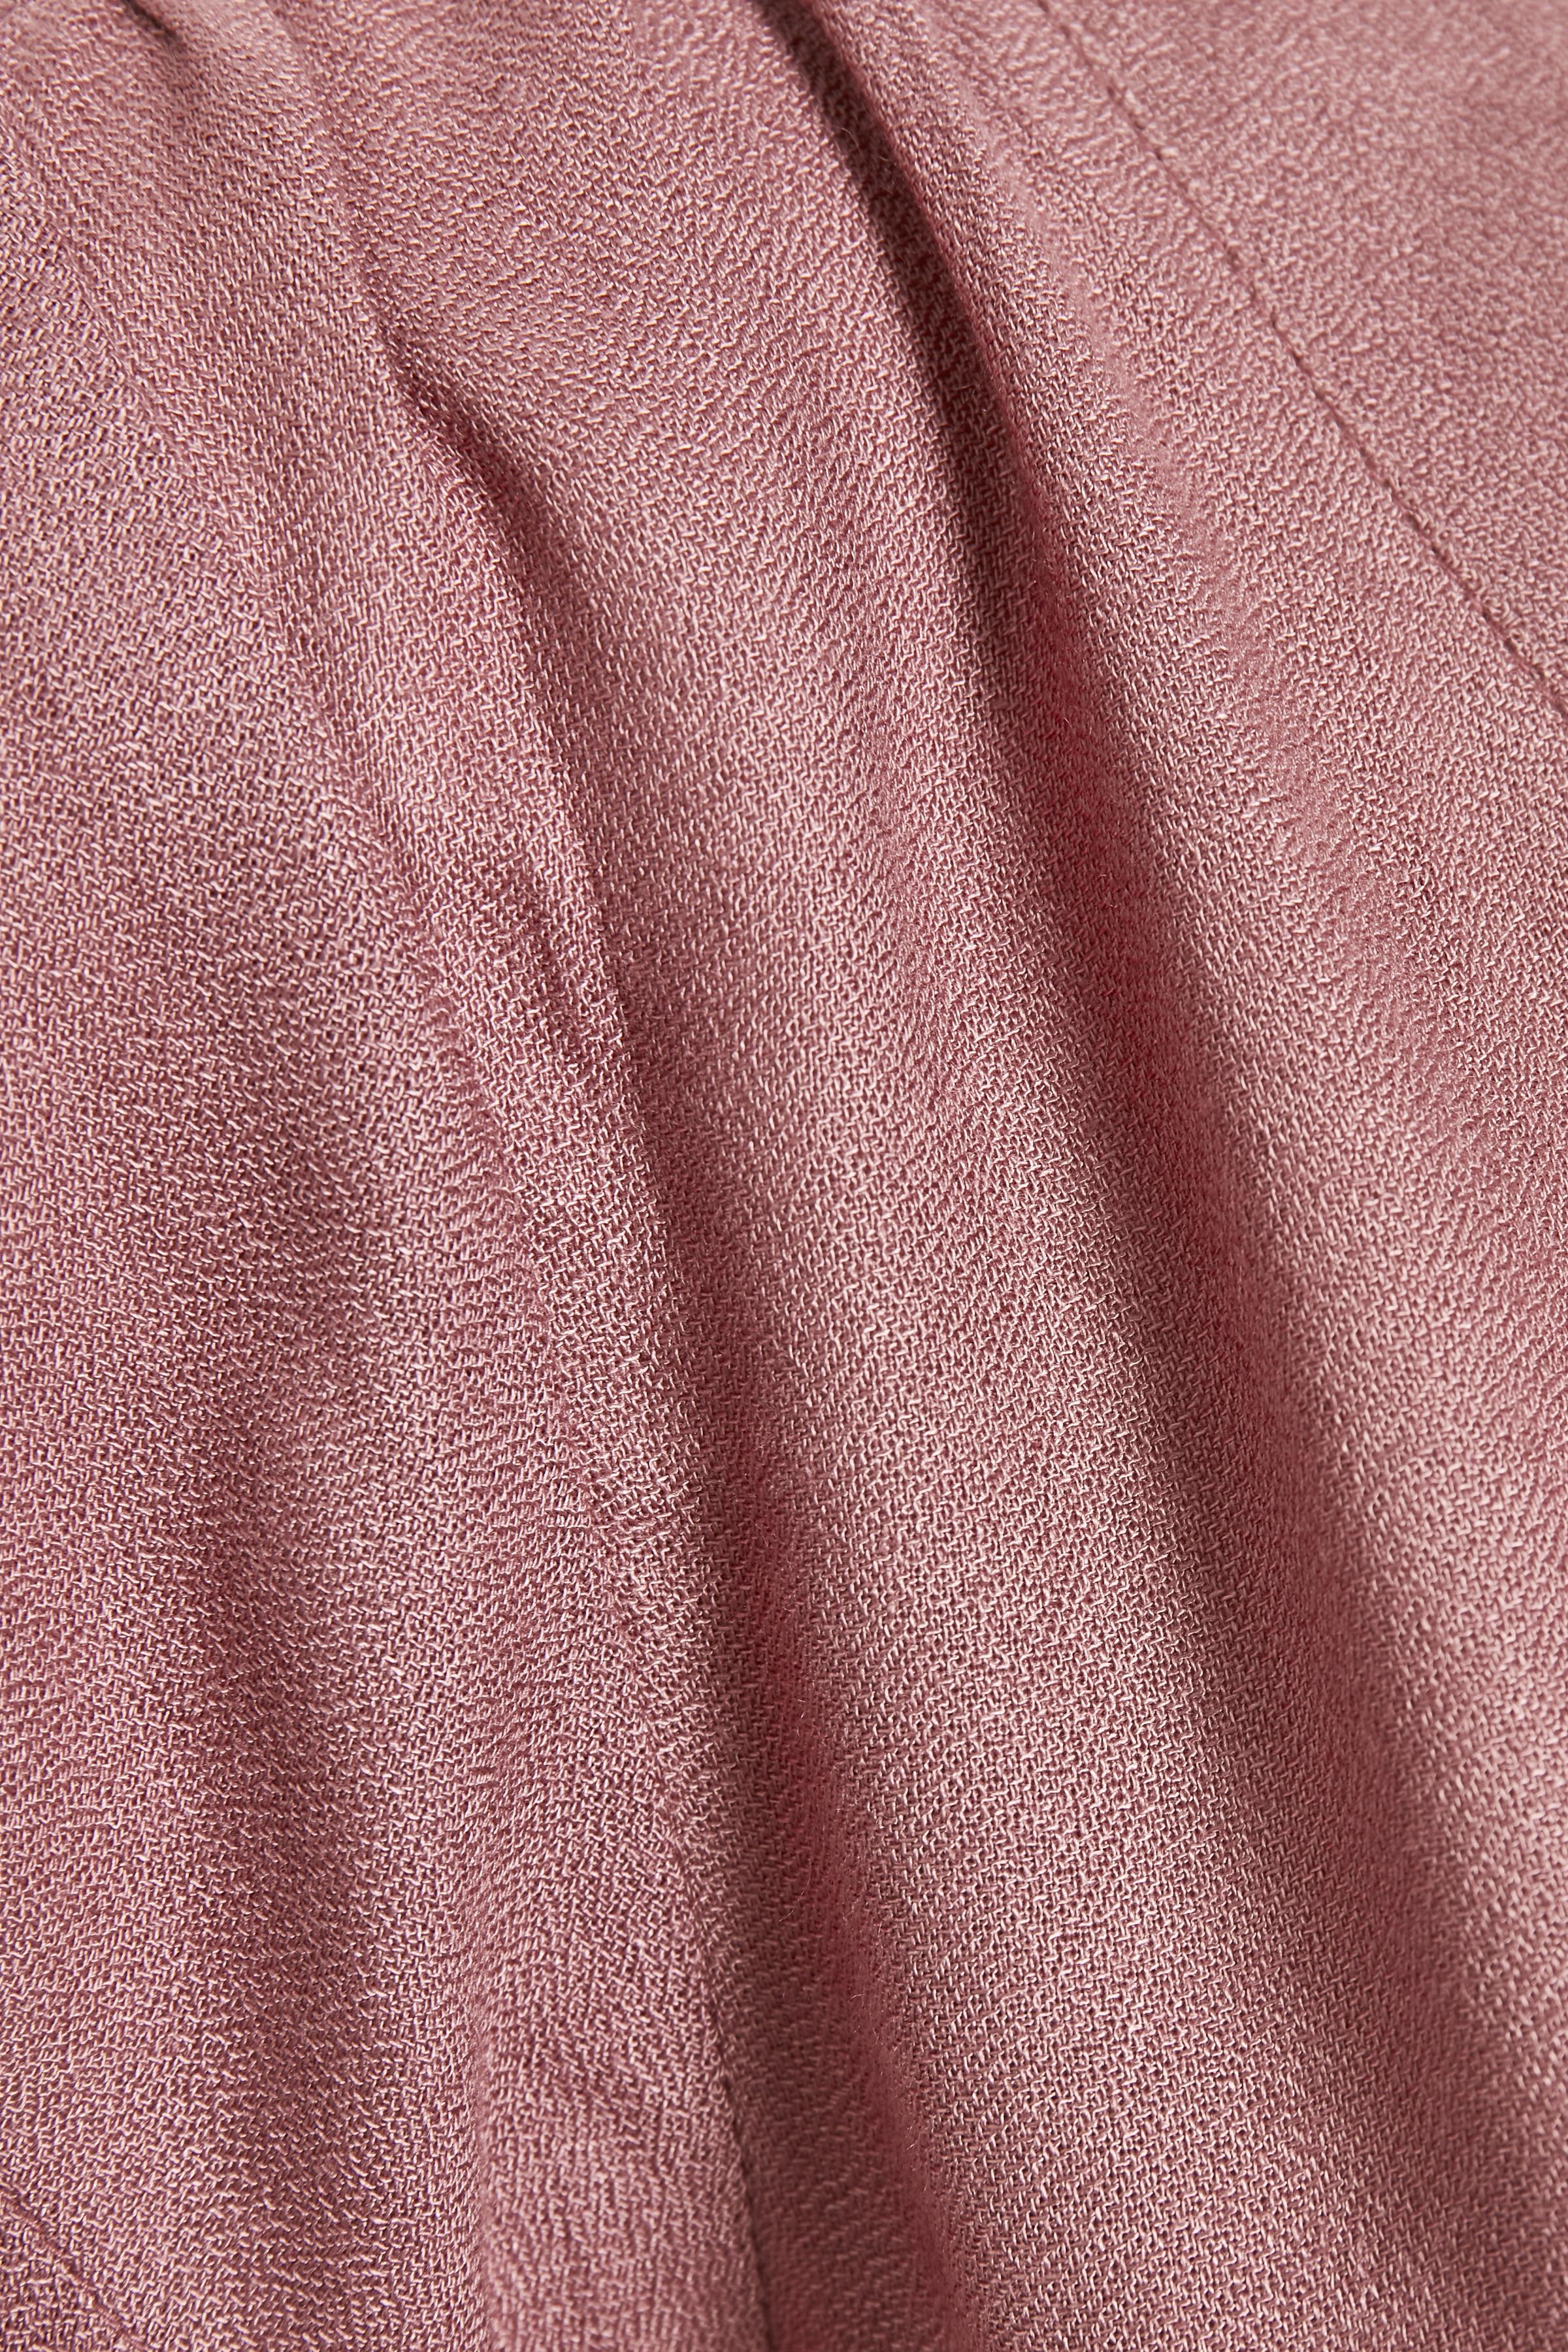 Dimljung Kortärmad blus  från Bon'A Parte – Köp Dimljung Kortärmad blus  från stl. S-2XL här